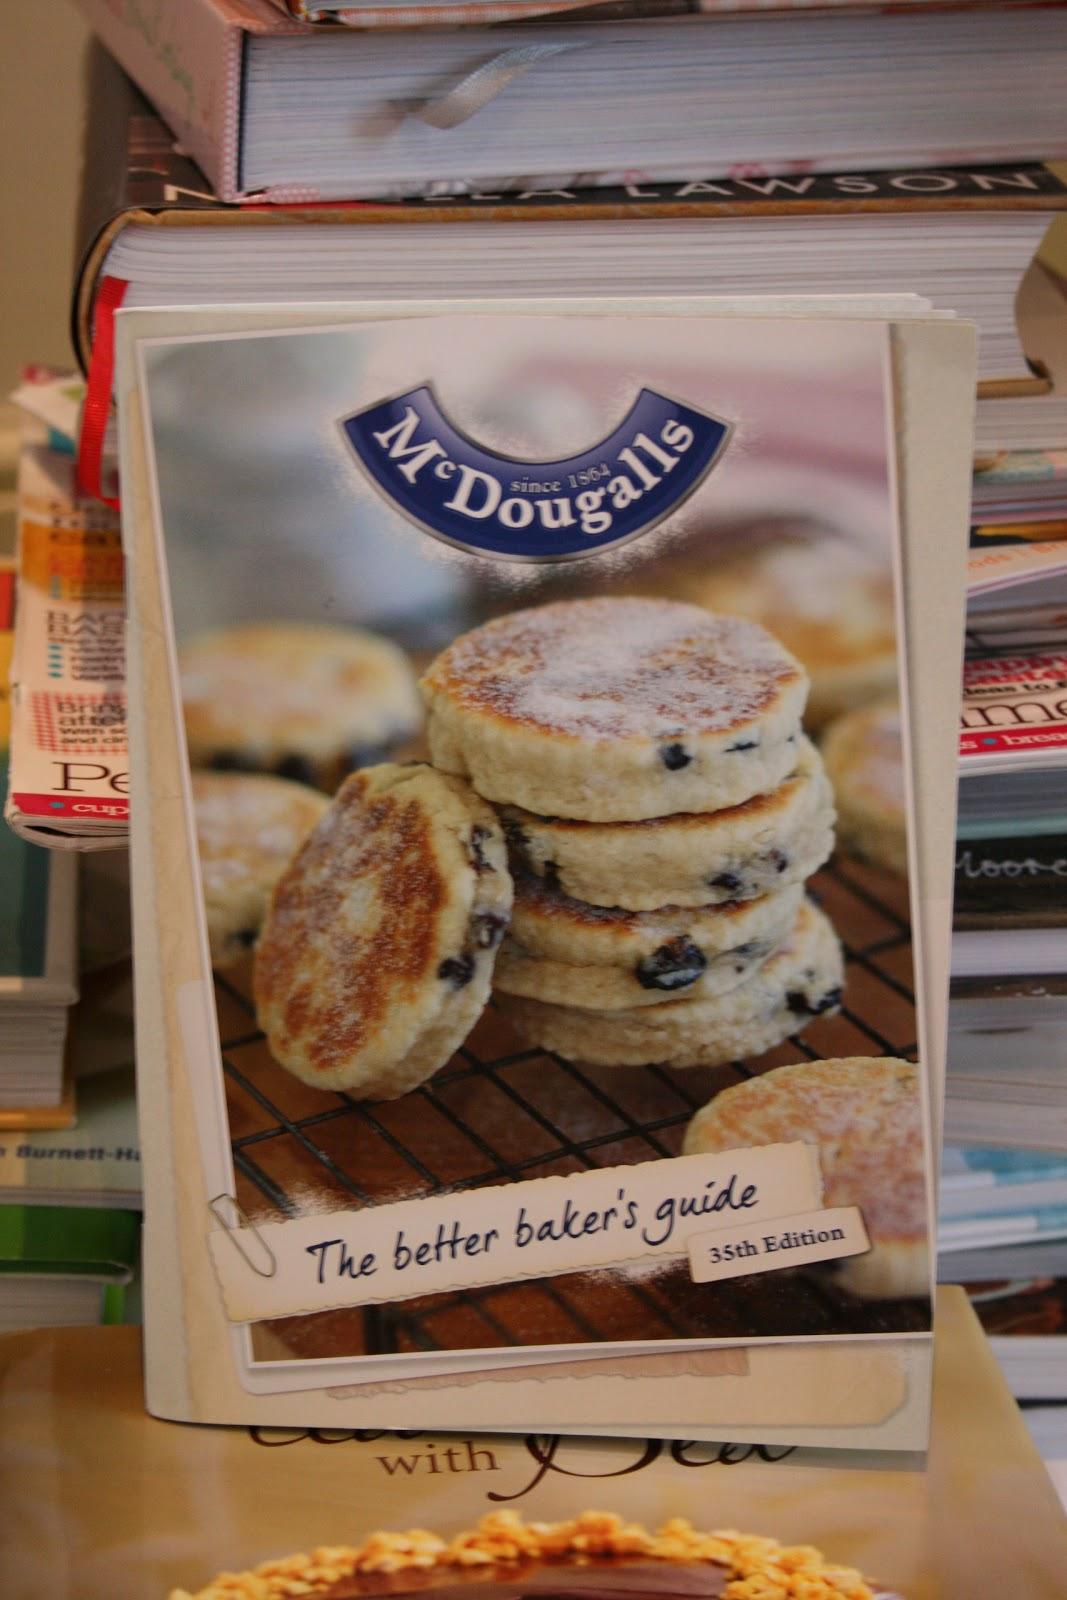 Mcdougalls Christmas Cake Recipe